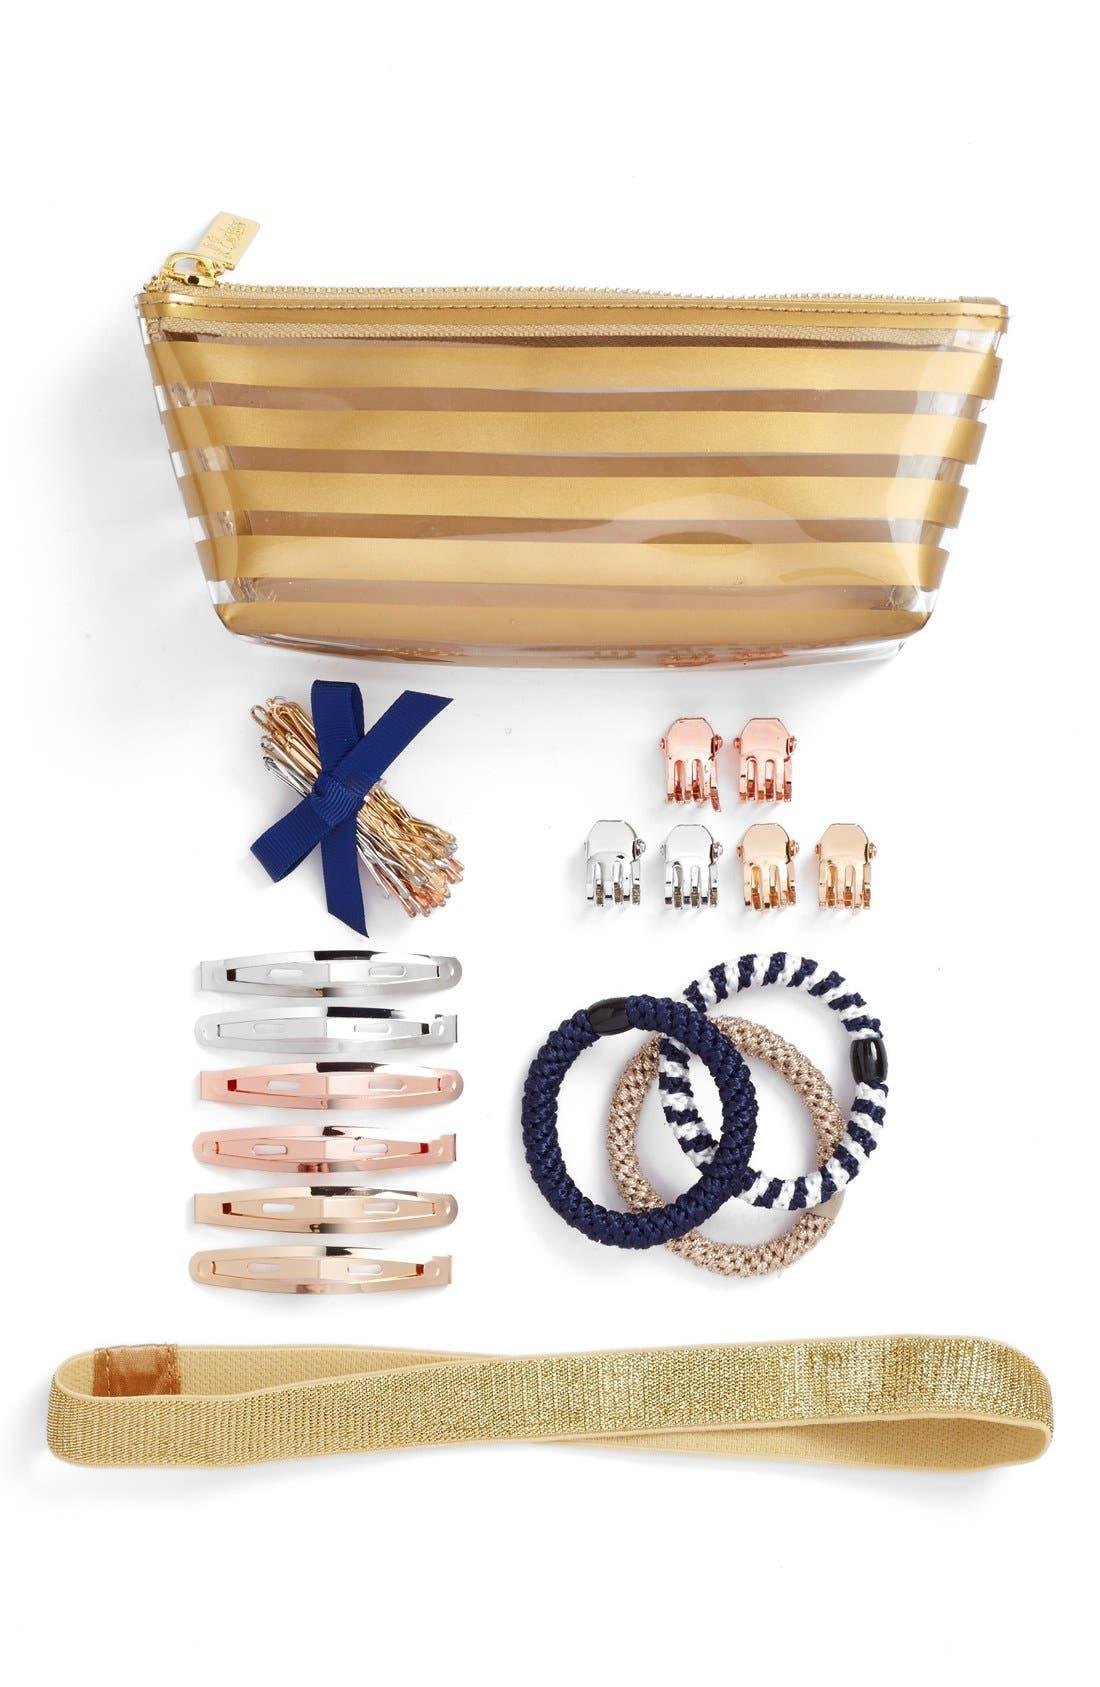 L. Erickson 'Hair Emergency' Kit (48-Piece)